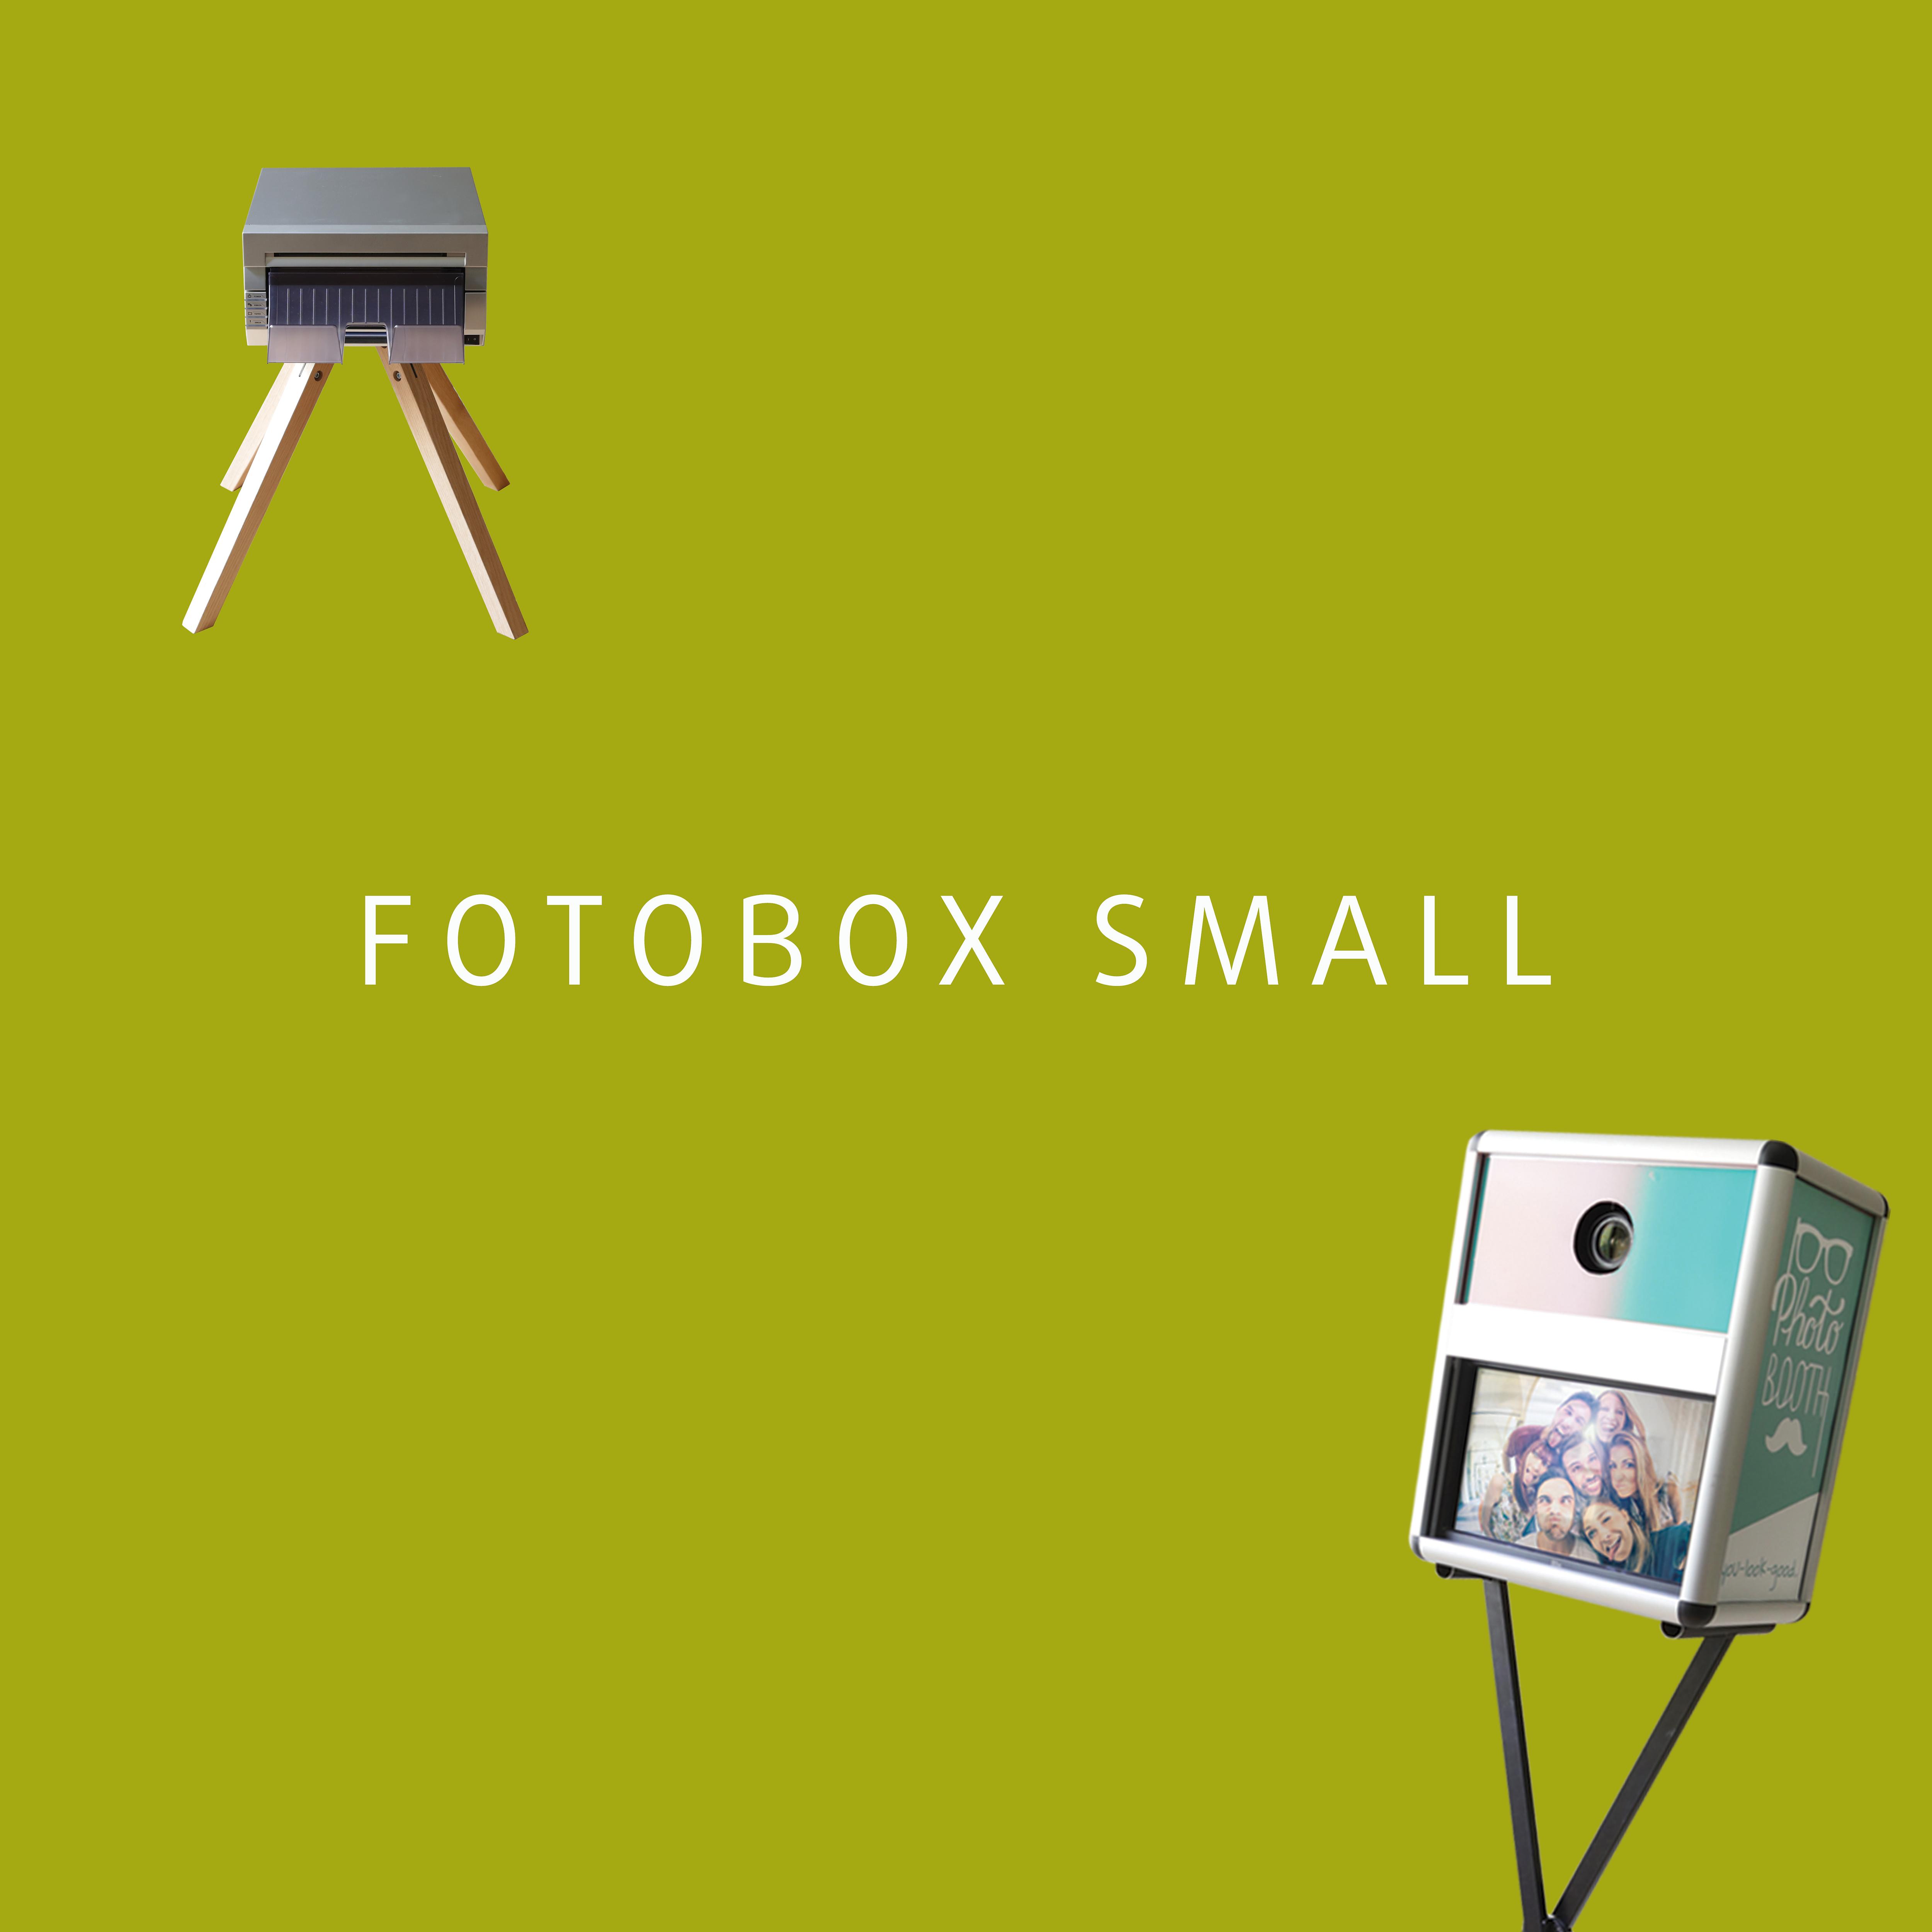 Fotobox Small